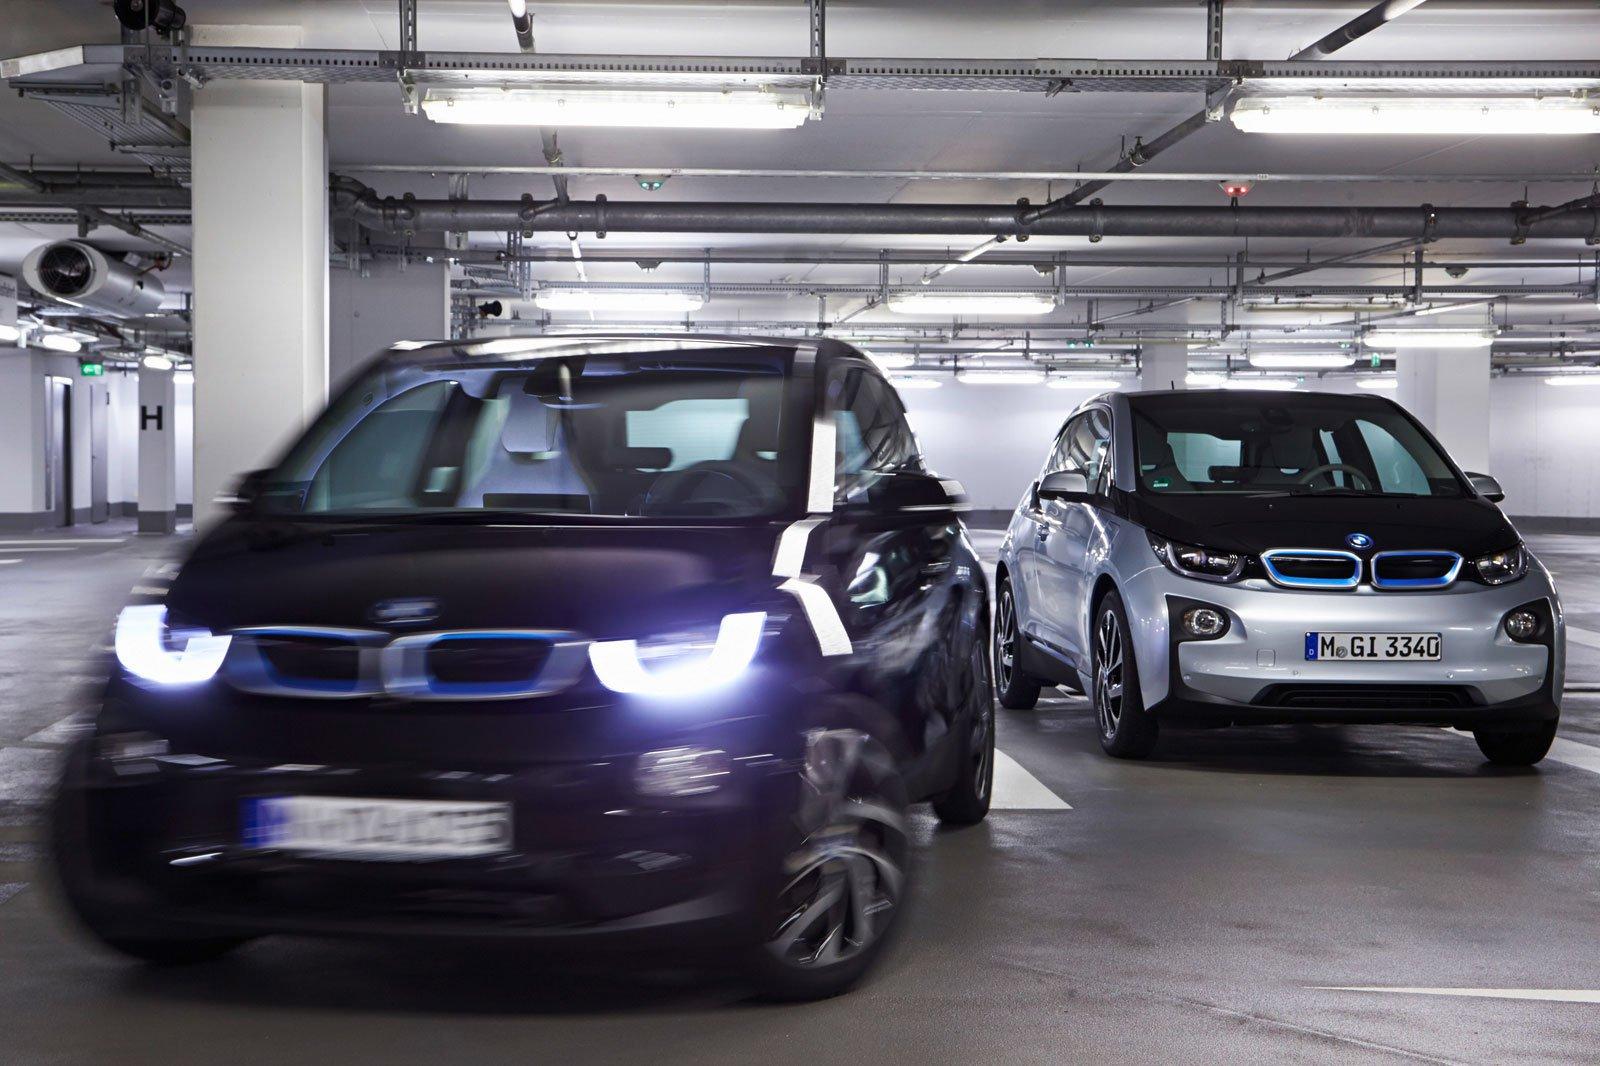 BMW parking assist